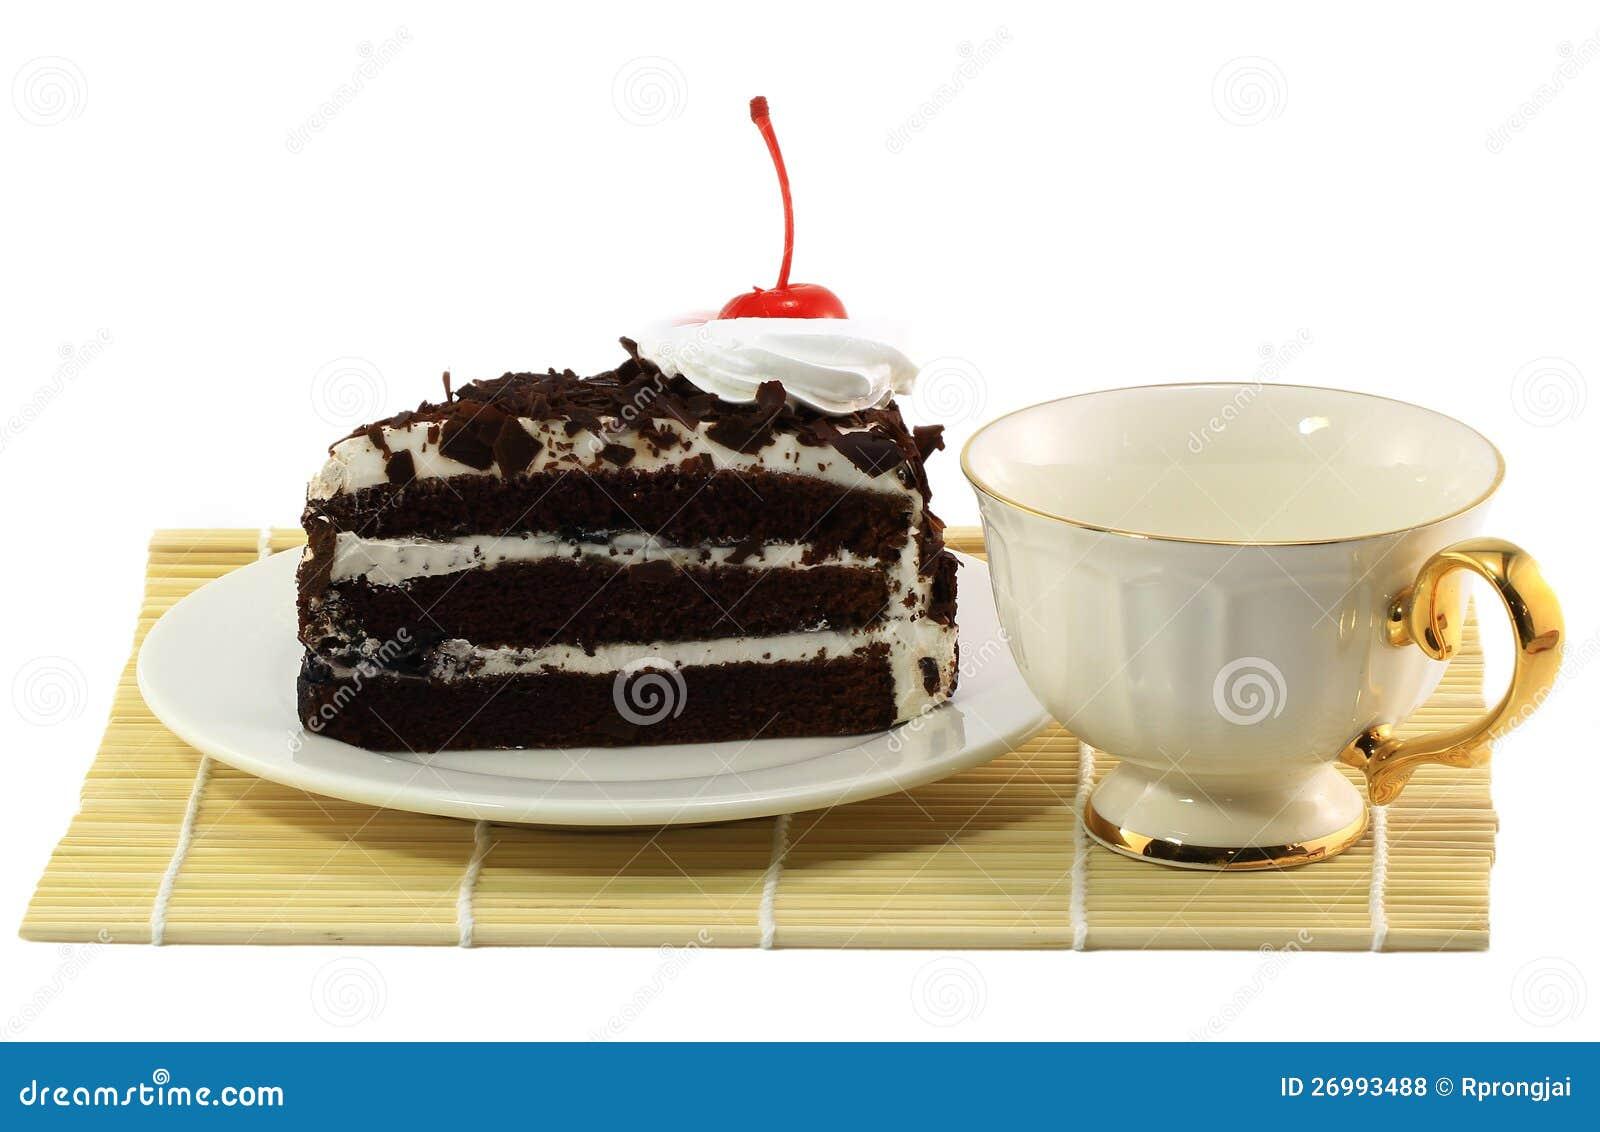 Tasty Chocolate Cake Images : Beautiful Tasty Chocolate Cake Royalty Free Stock Photos ...